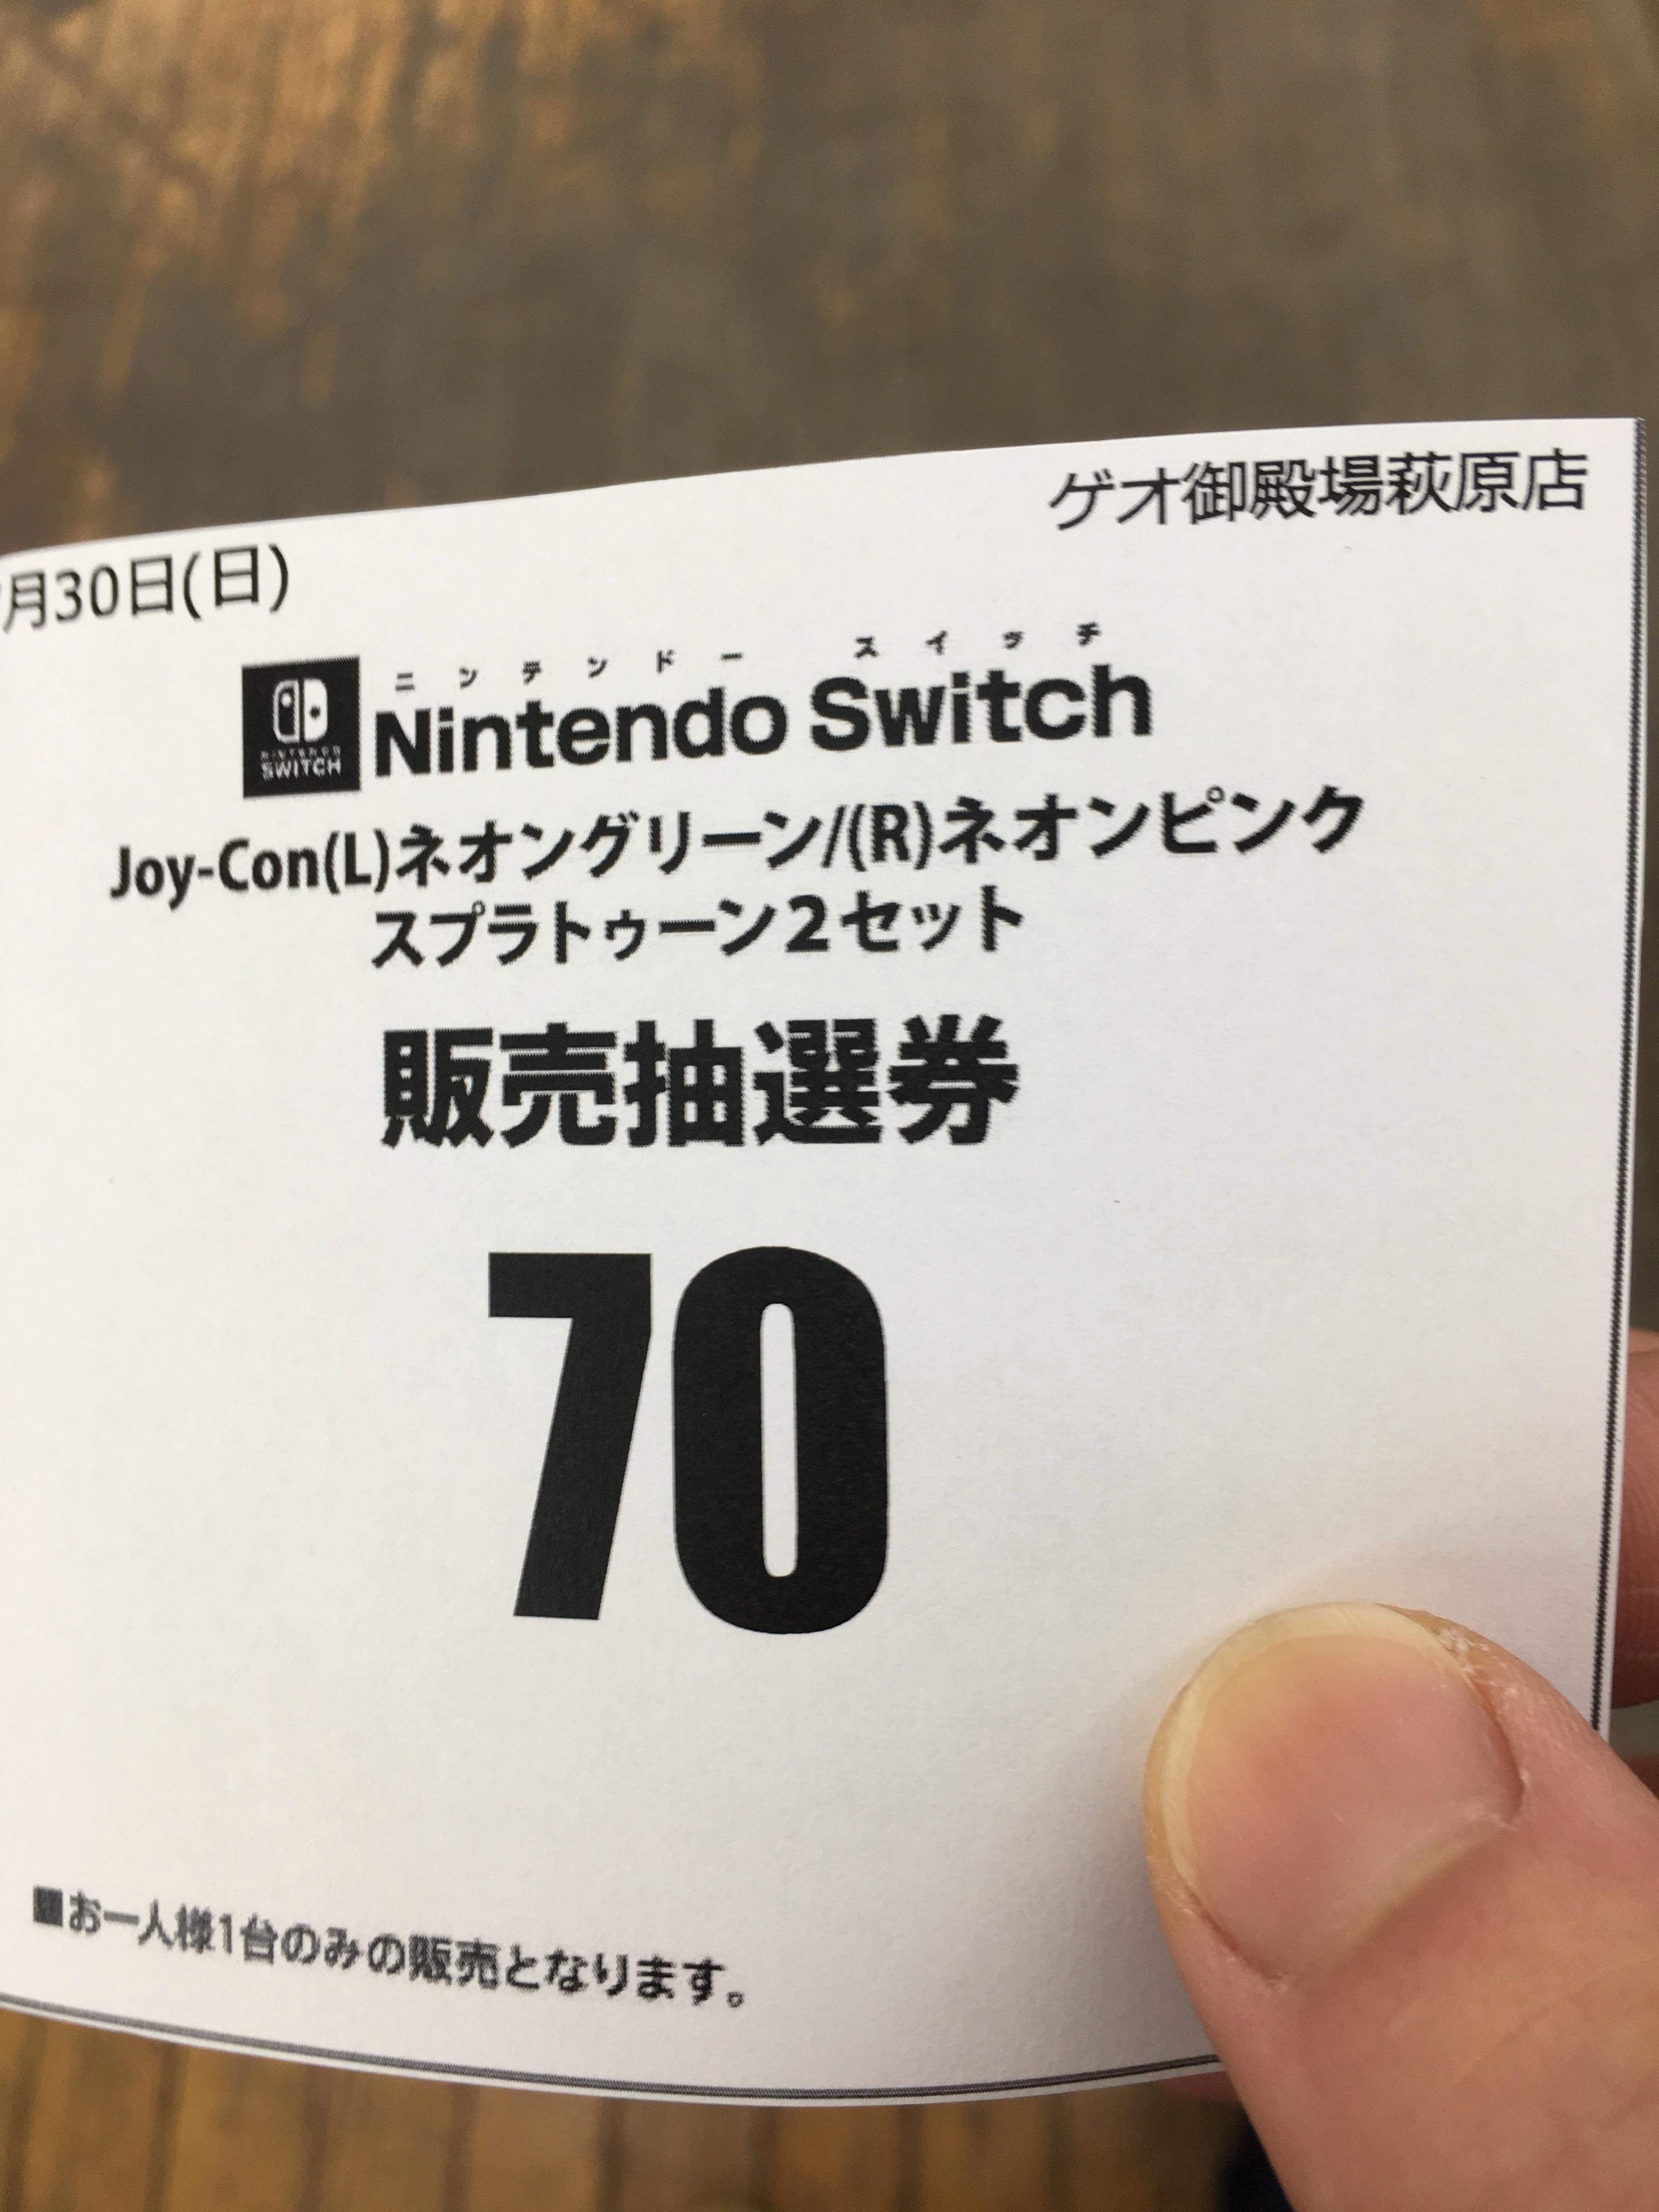 Switchを求め販売抽選会に参加。人数が多すぎて驚きでした